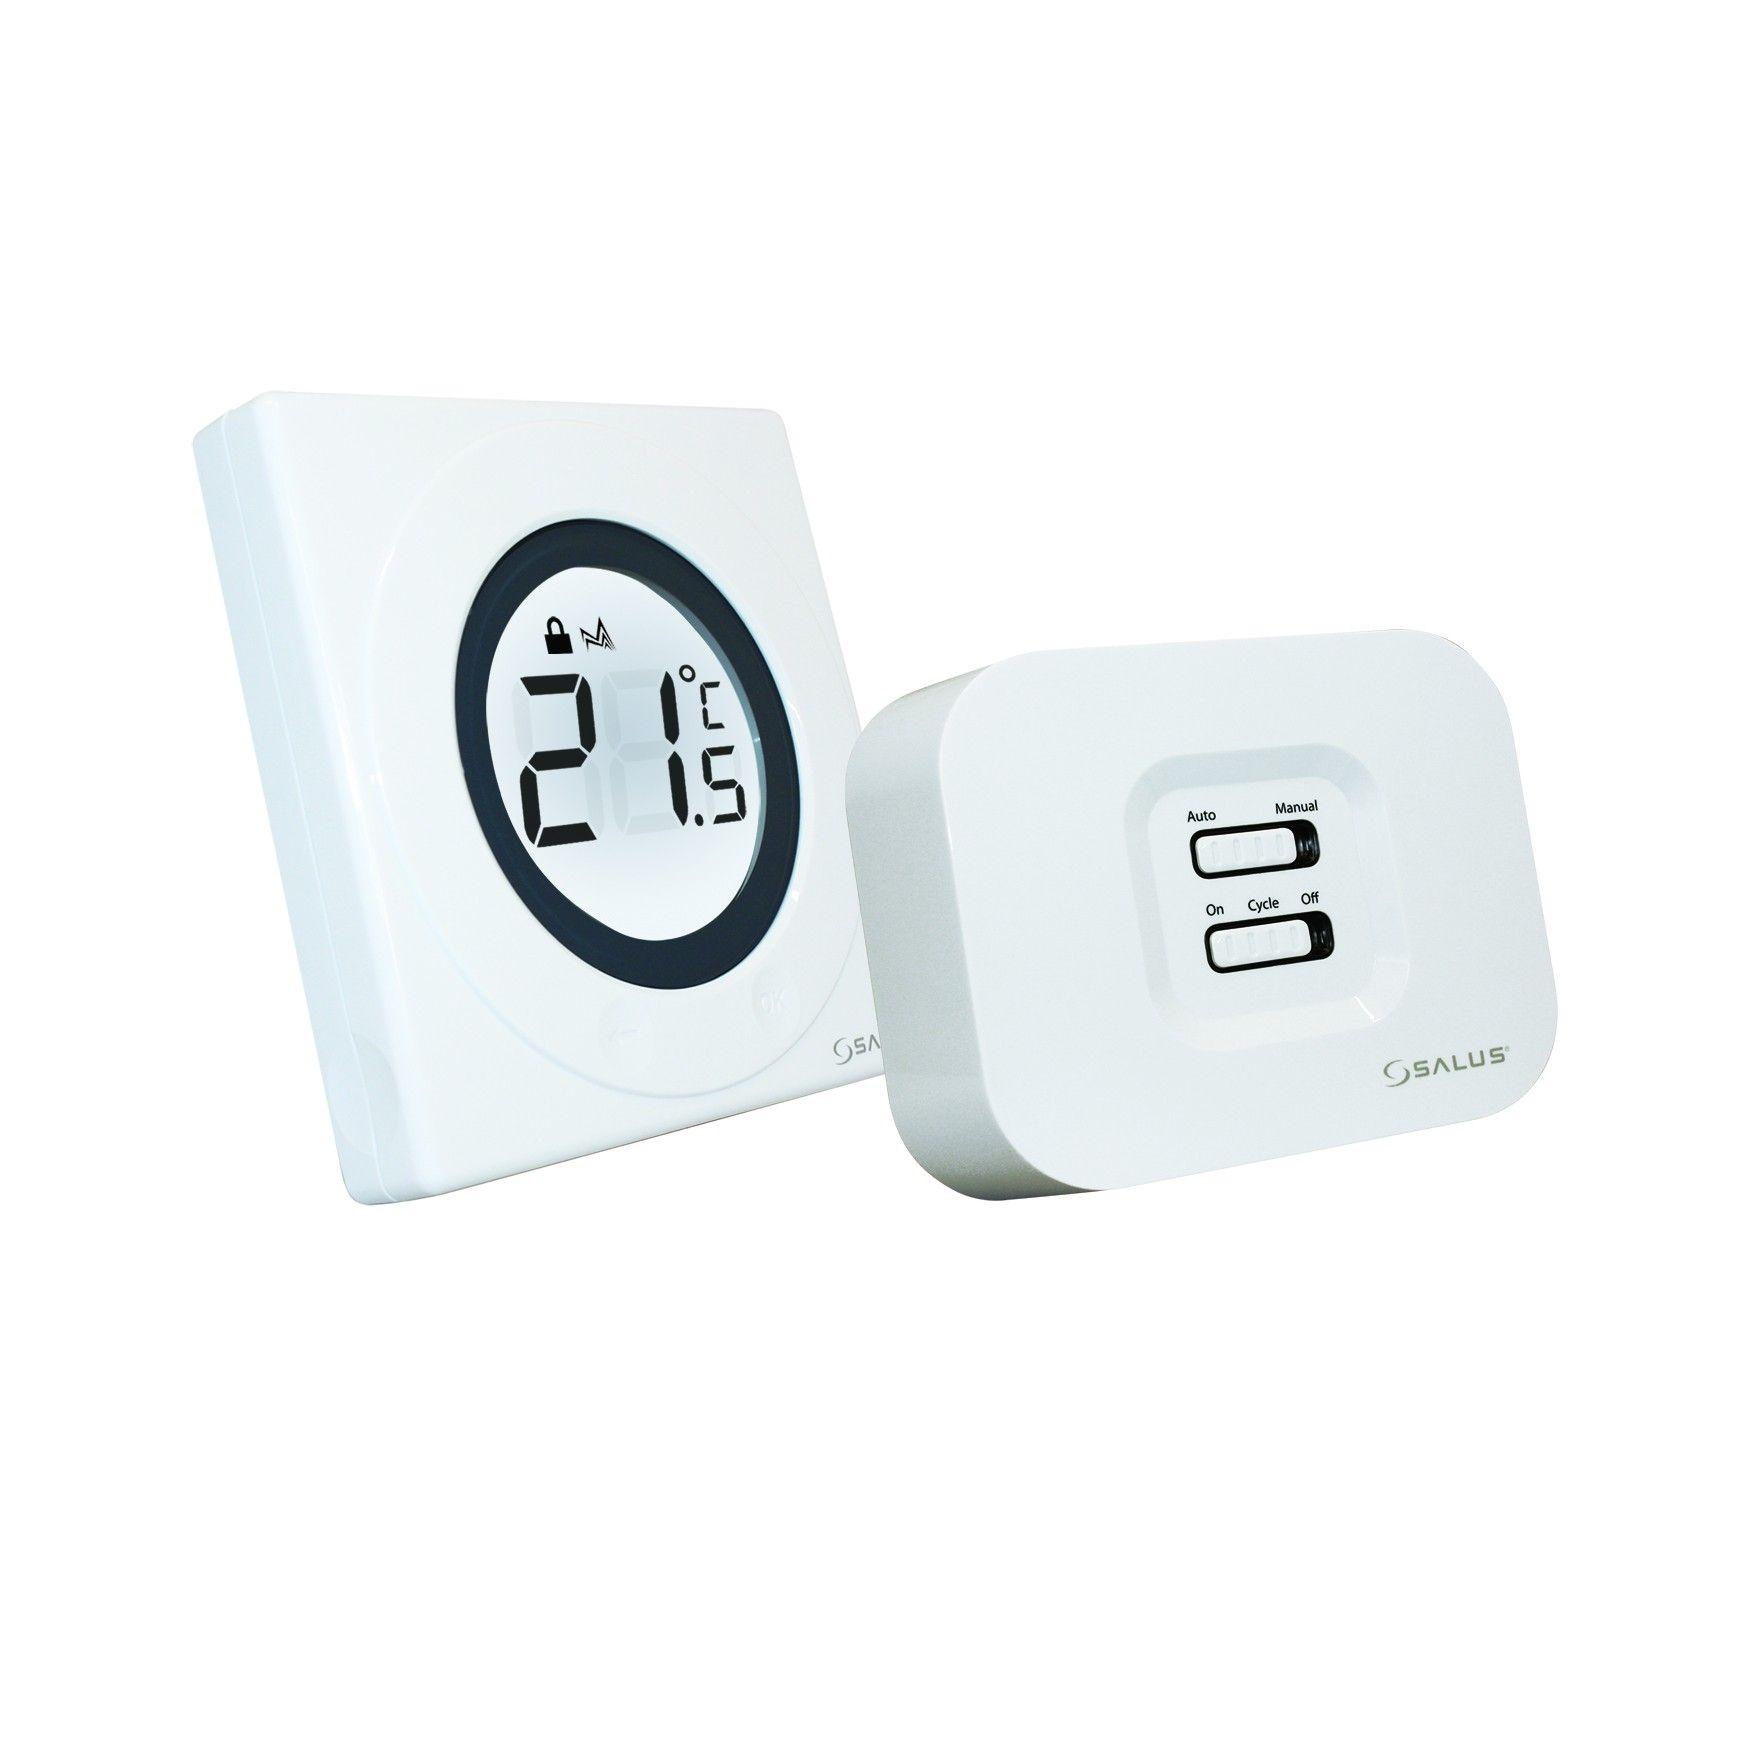 Termostat ambiental neprogramabil cu radio comanda Salus ST320RF, cu butoane tactile imagine fornello.ro